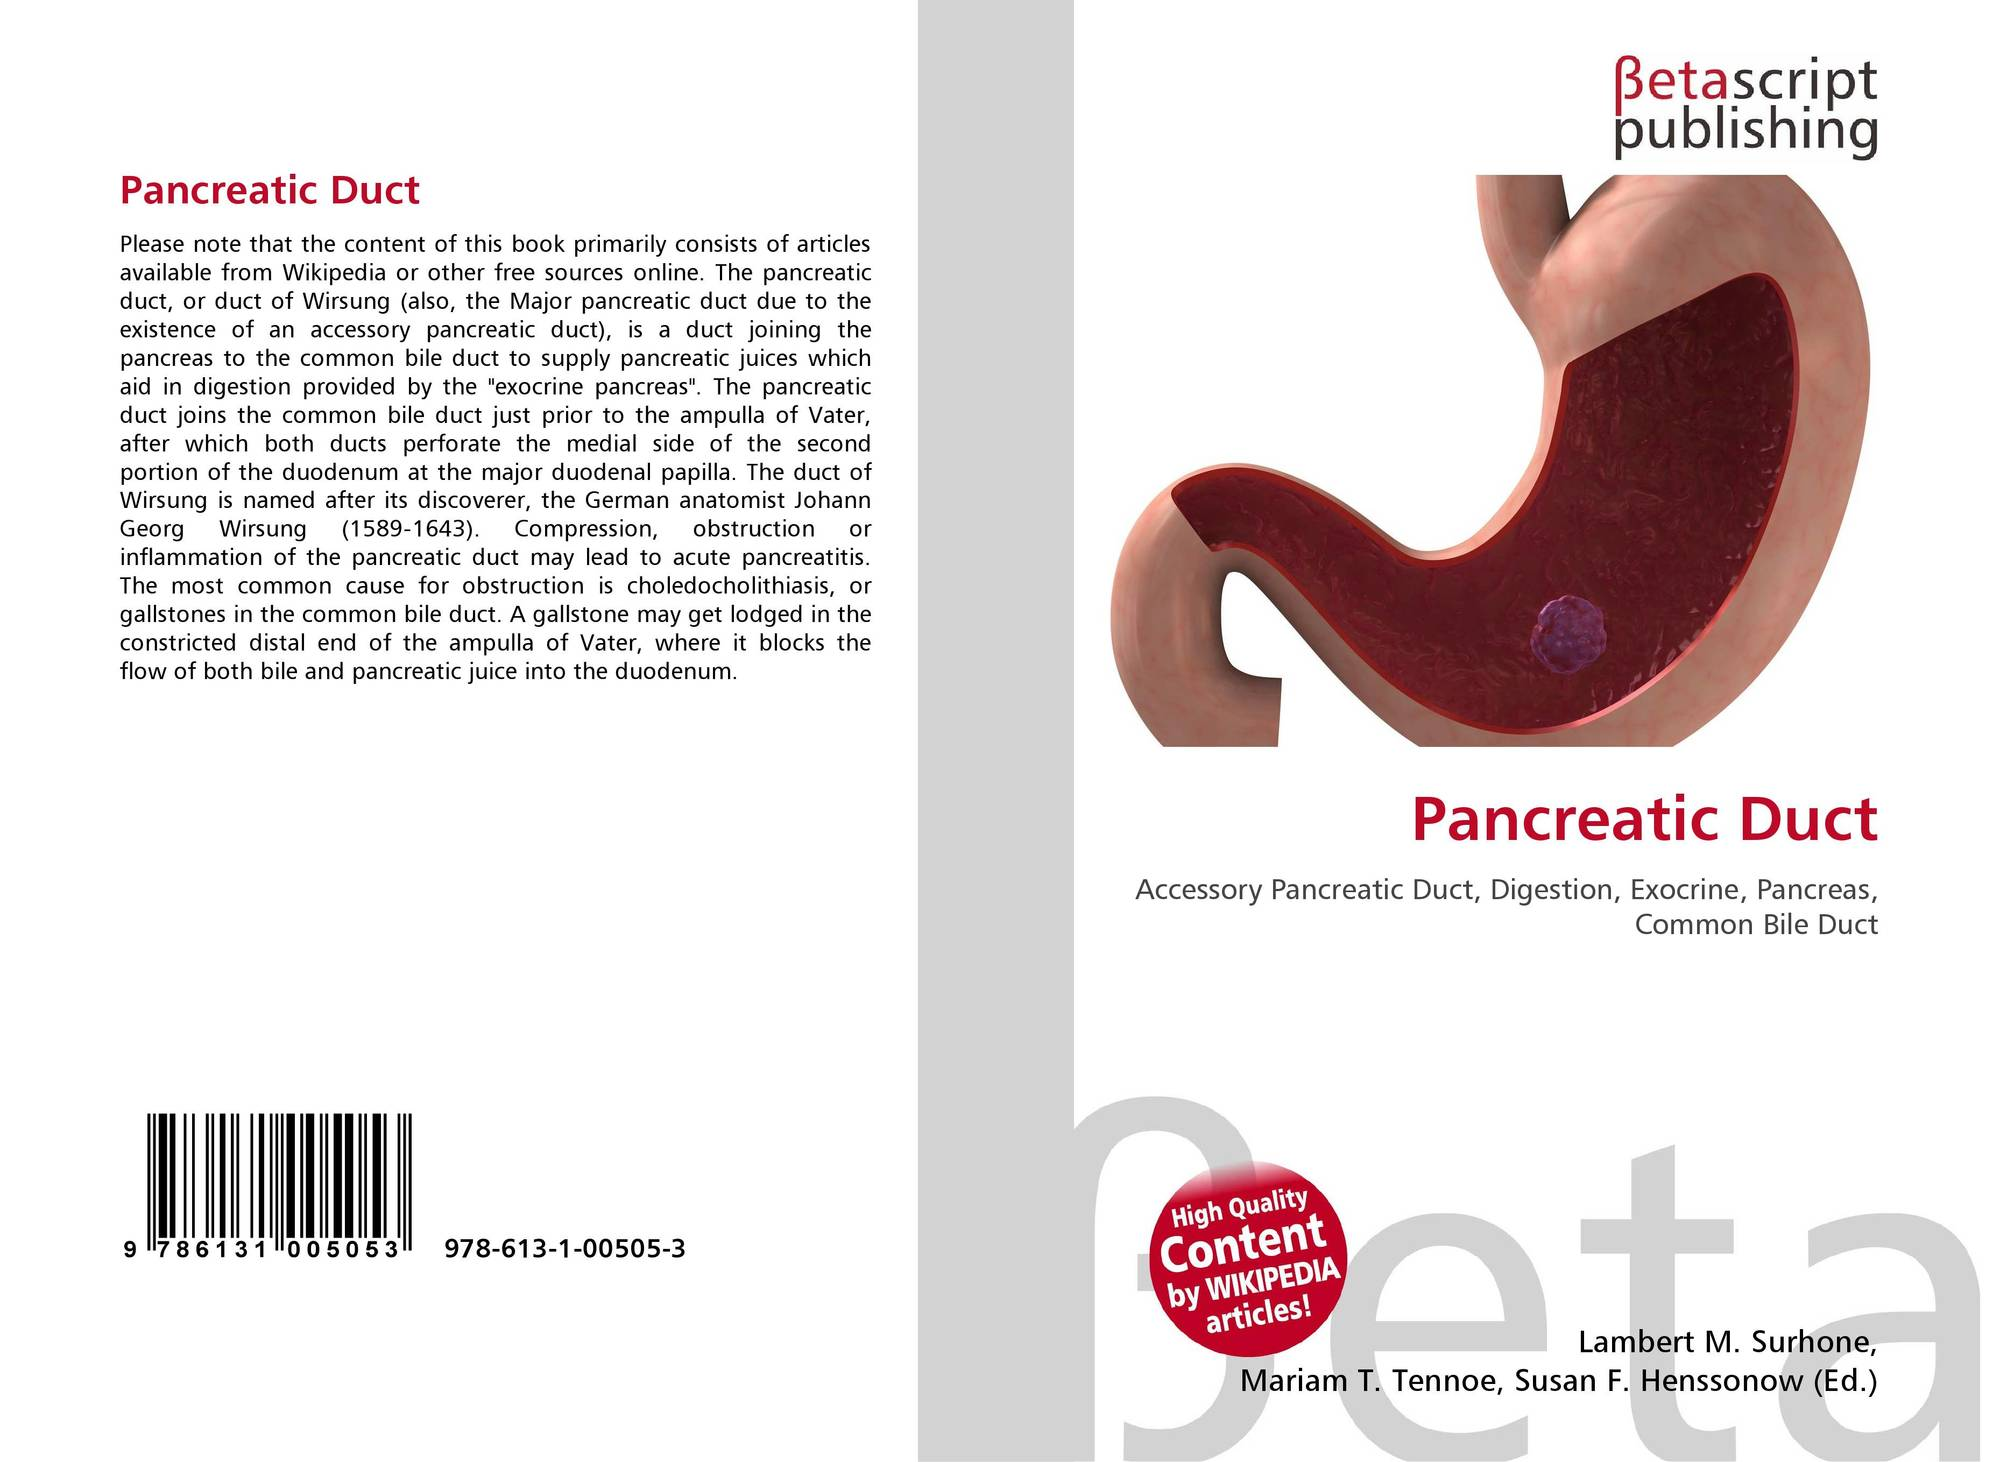 Pancreatic Duct 978 613 1 00505 3 6131005052 9786131005053